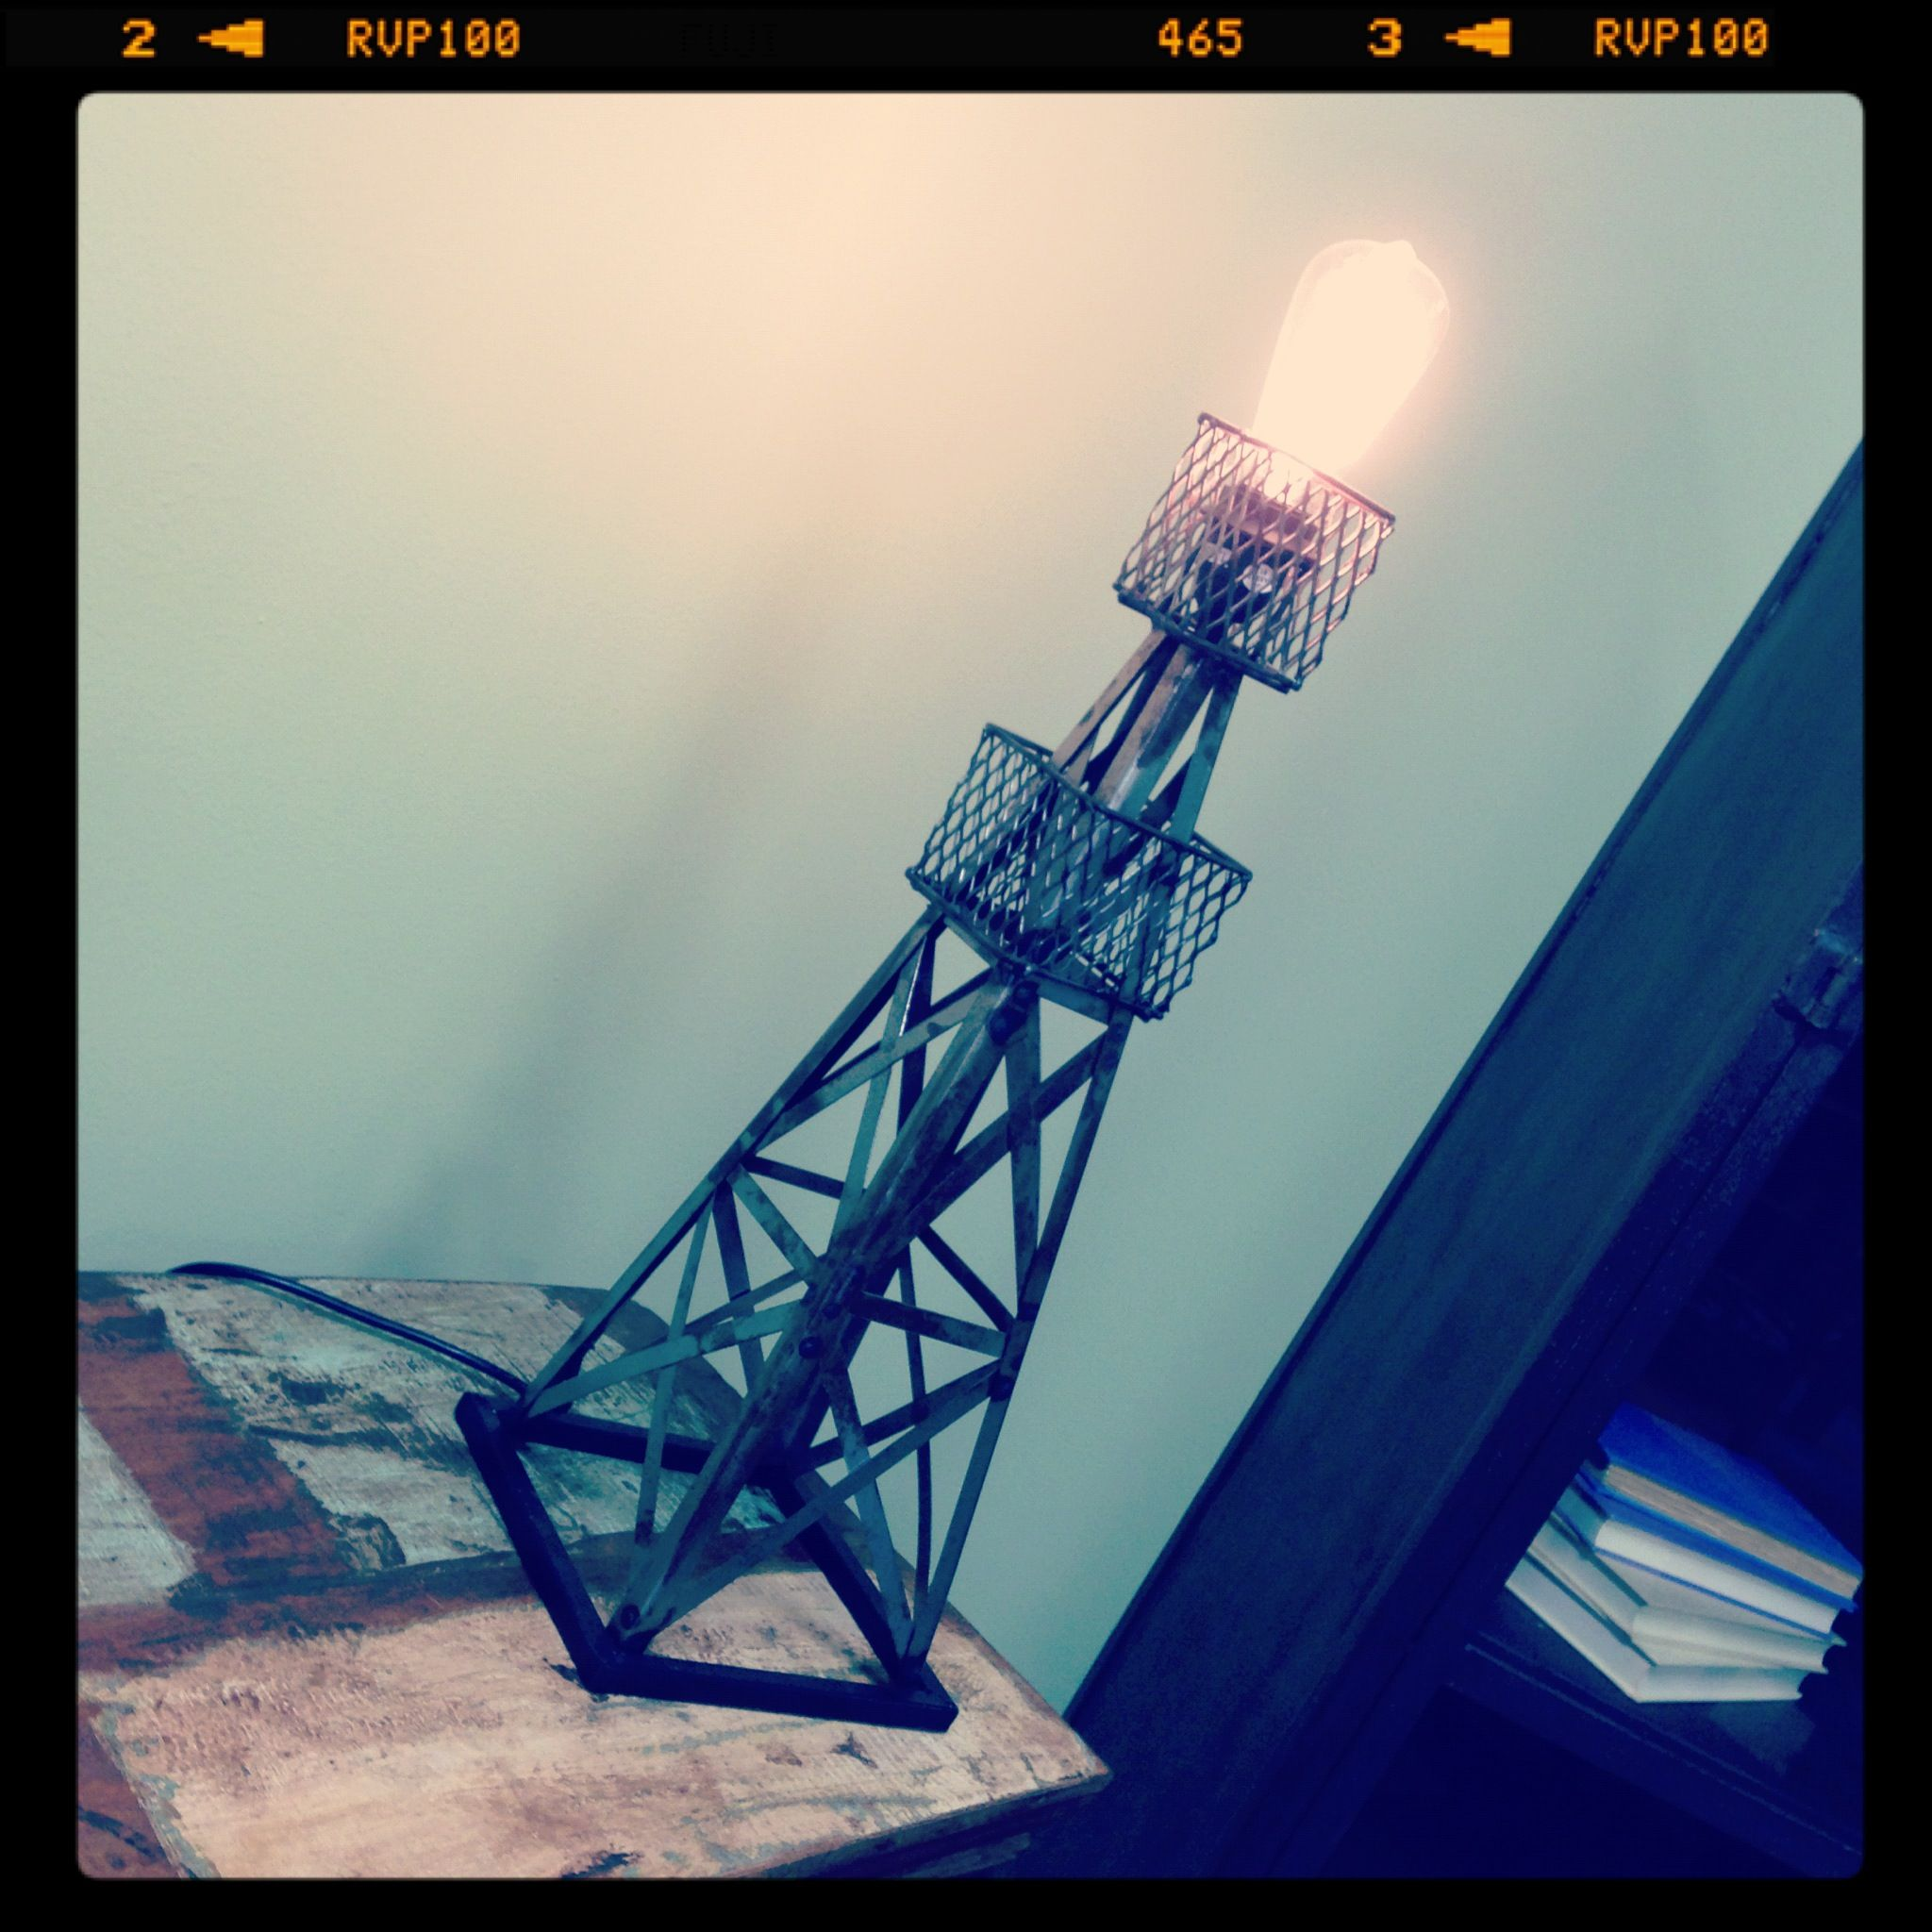 Oil Derrick Table Lamp Distressed Vintage Import Unique Furniture ...